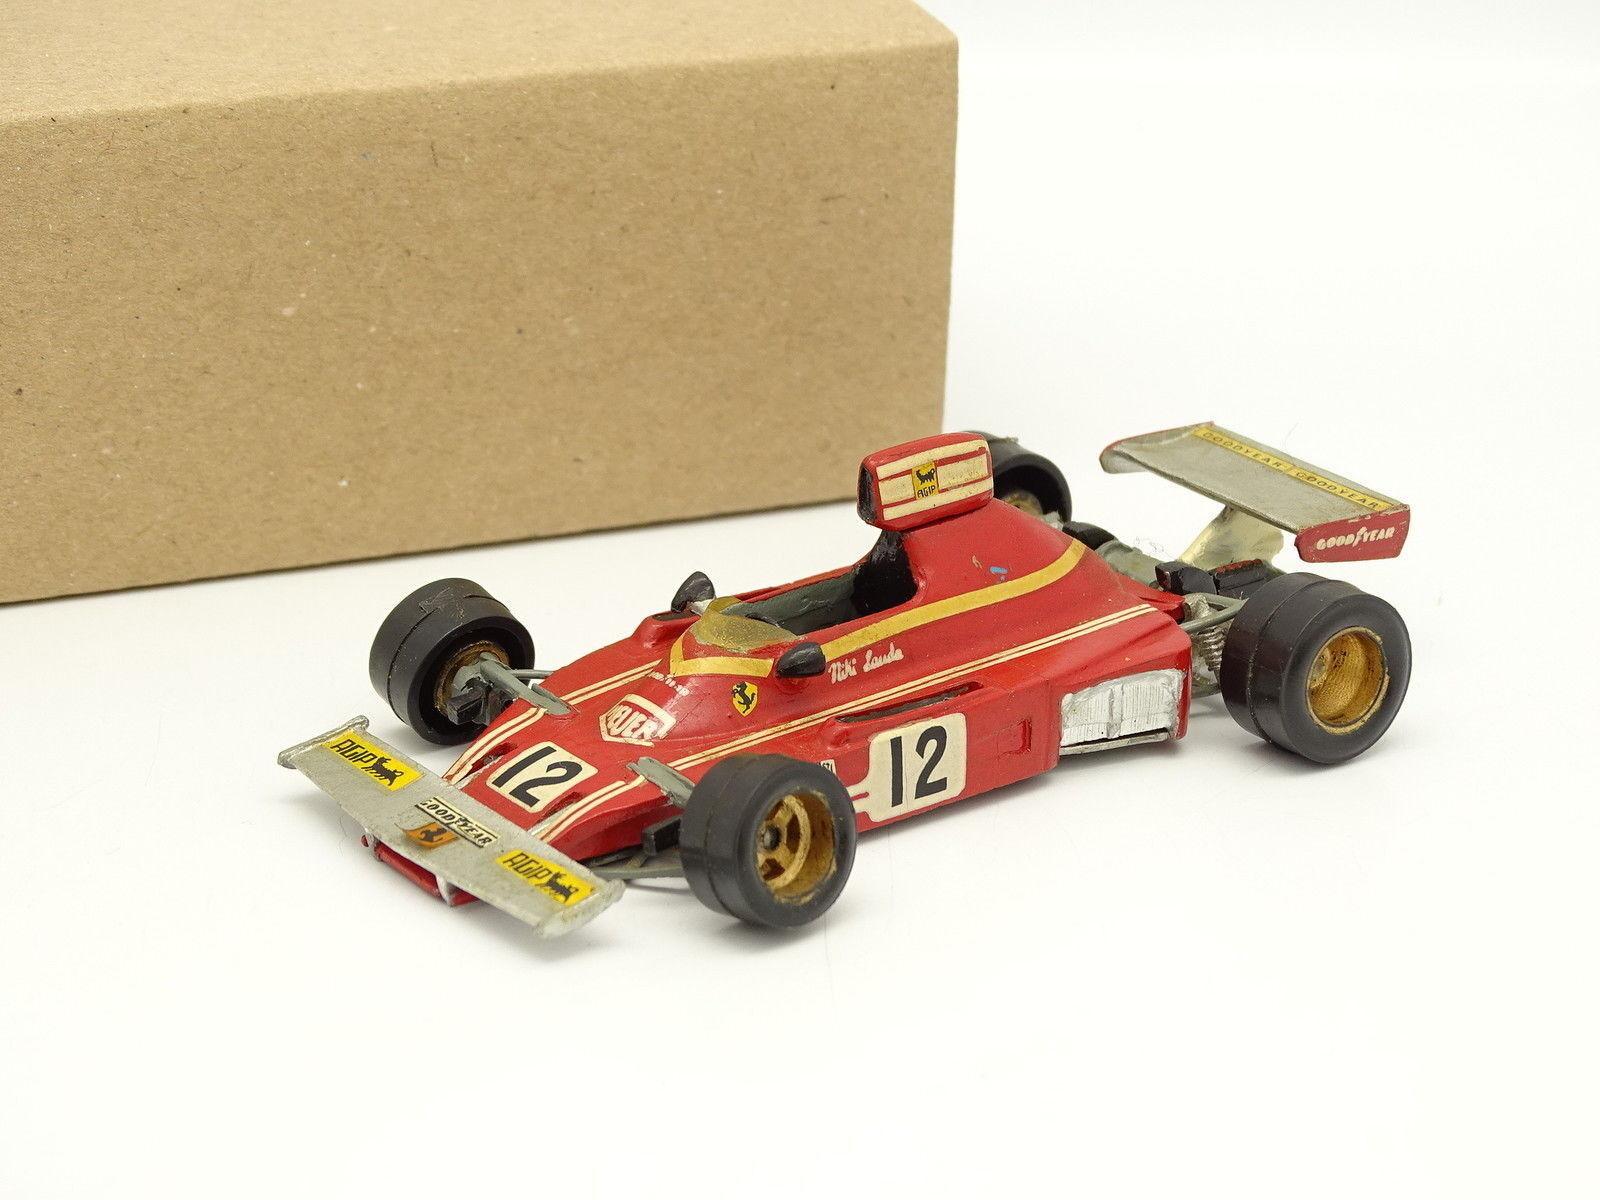 Set Metall Aufgebaut 1 43 - F1 Ferrari 312 312 312 B3 1974 Lauda b07589